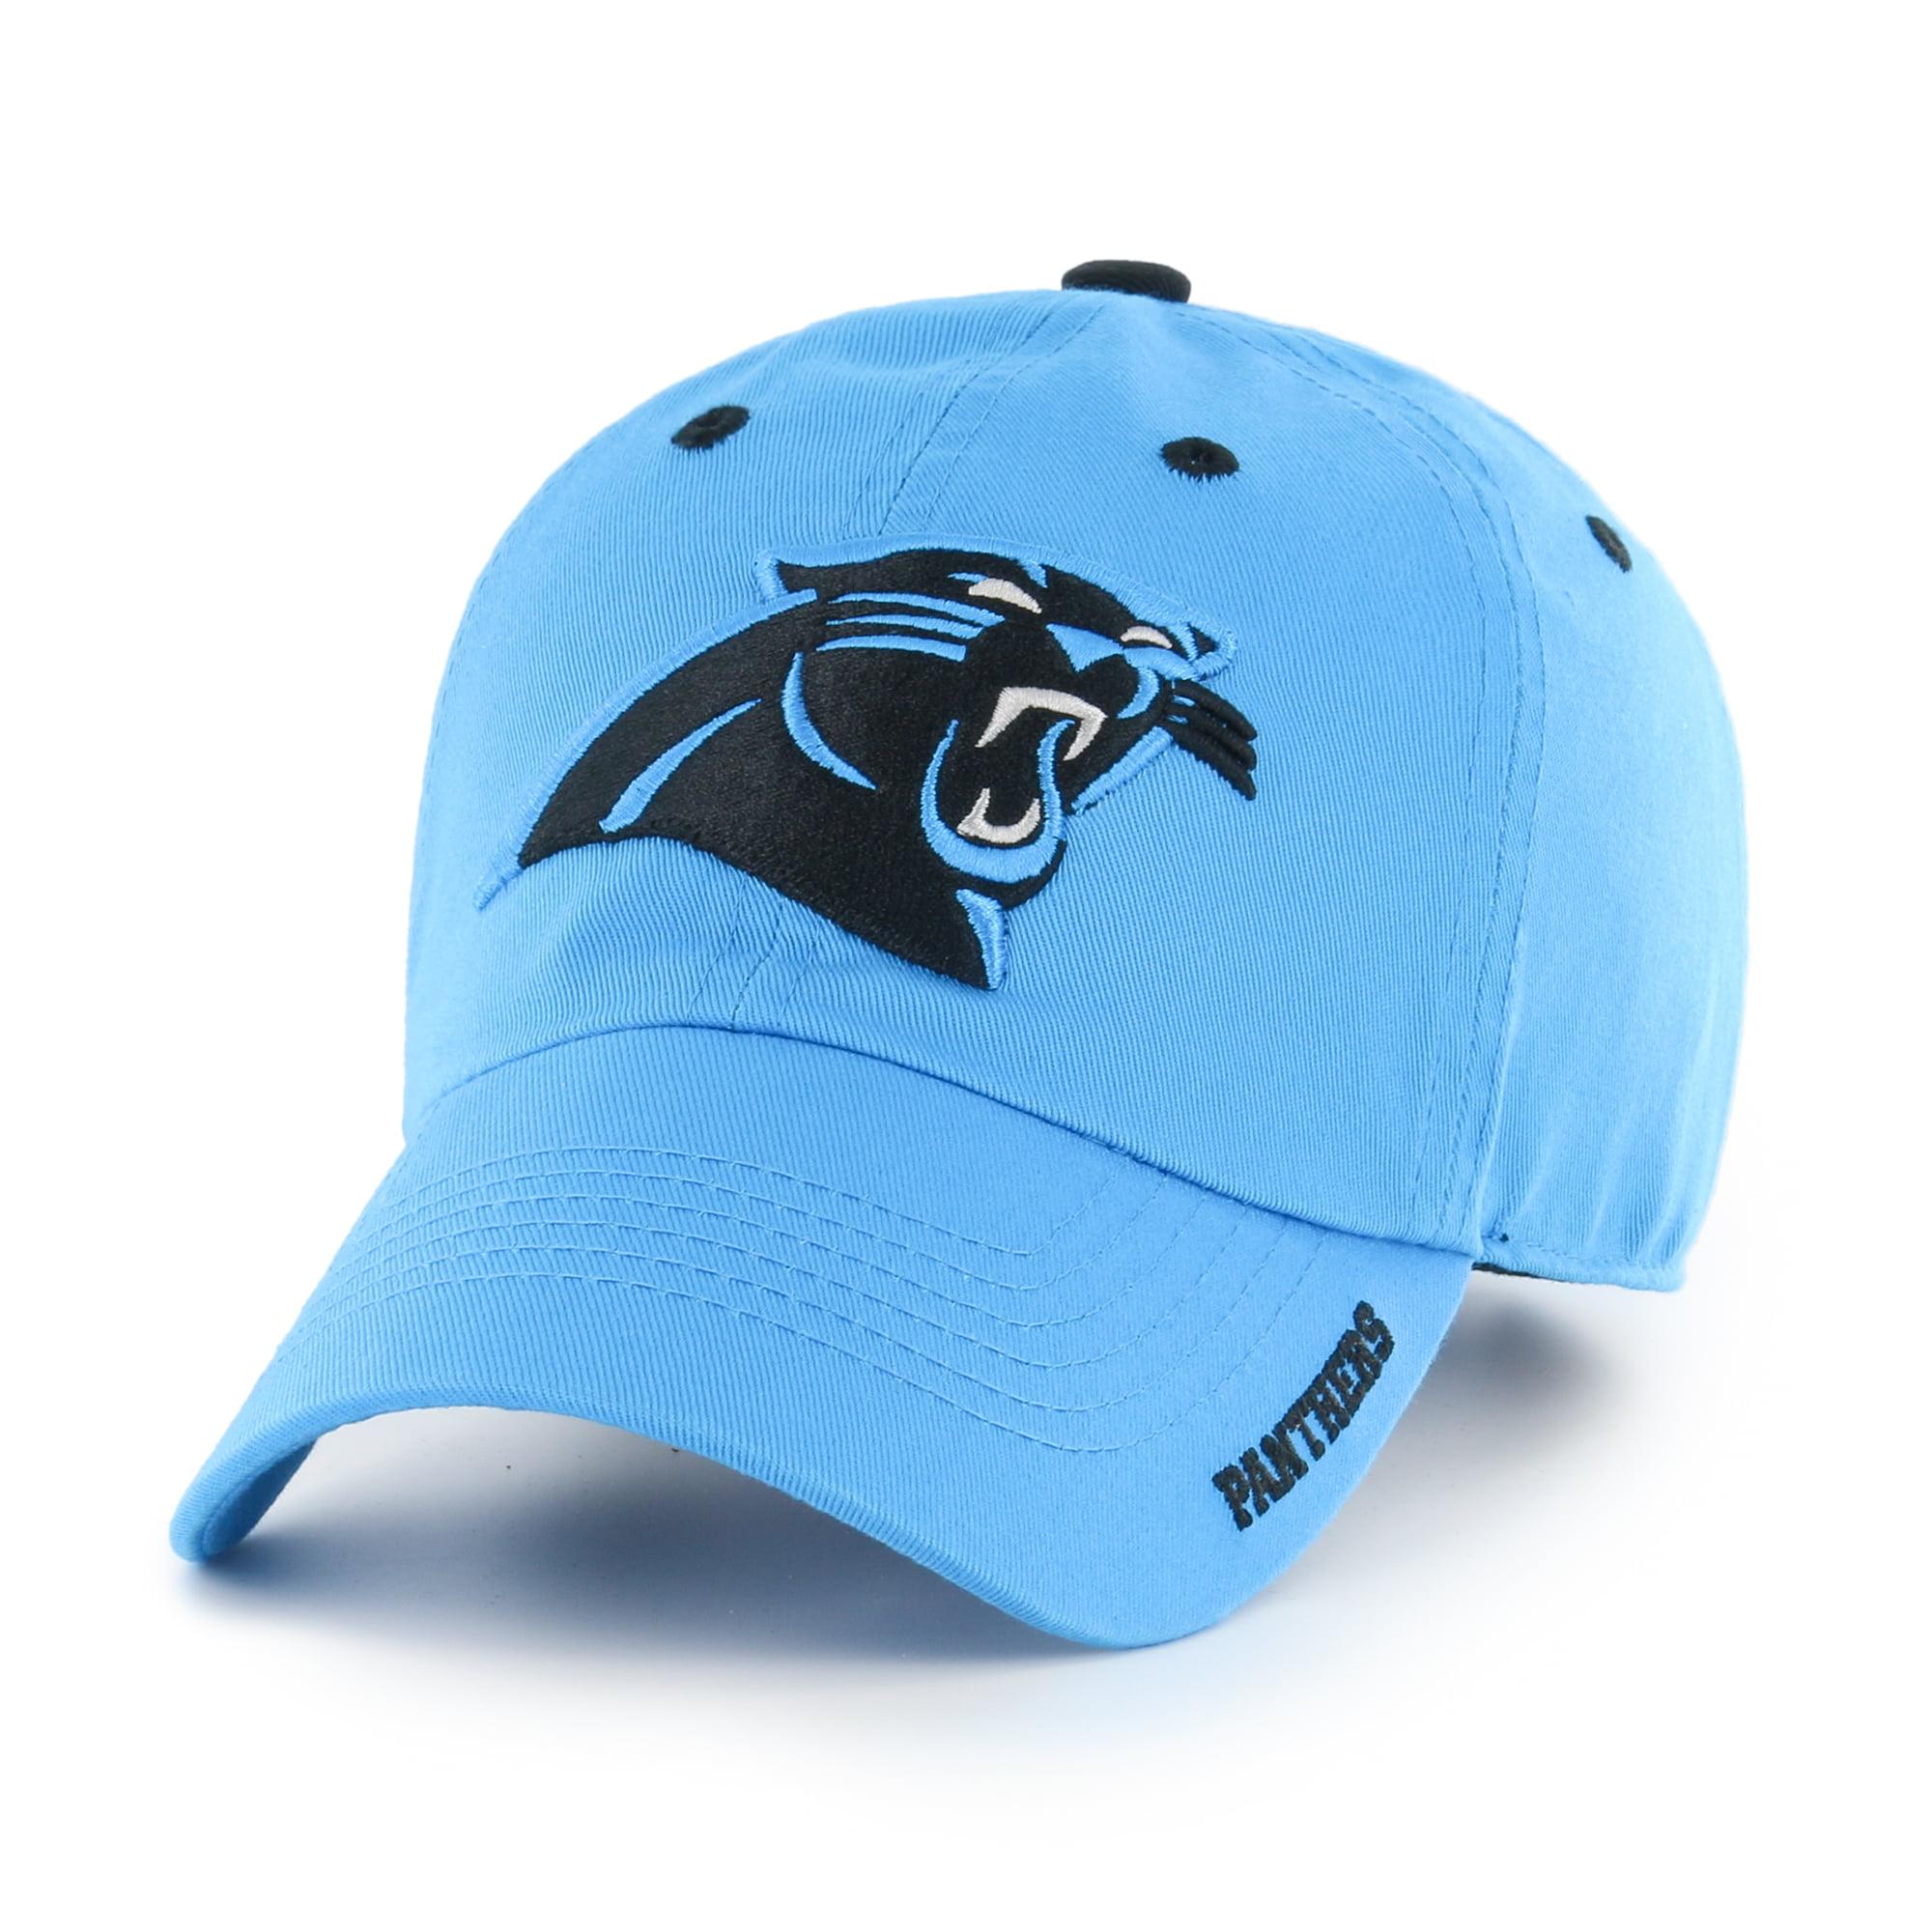 NFL Carolina Panthers Ice Adjustable Cap/Hat by Fan Favorite